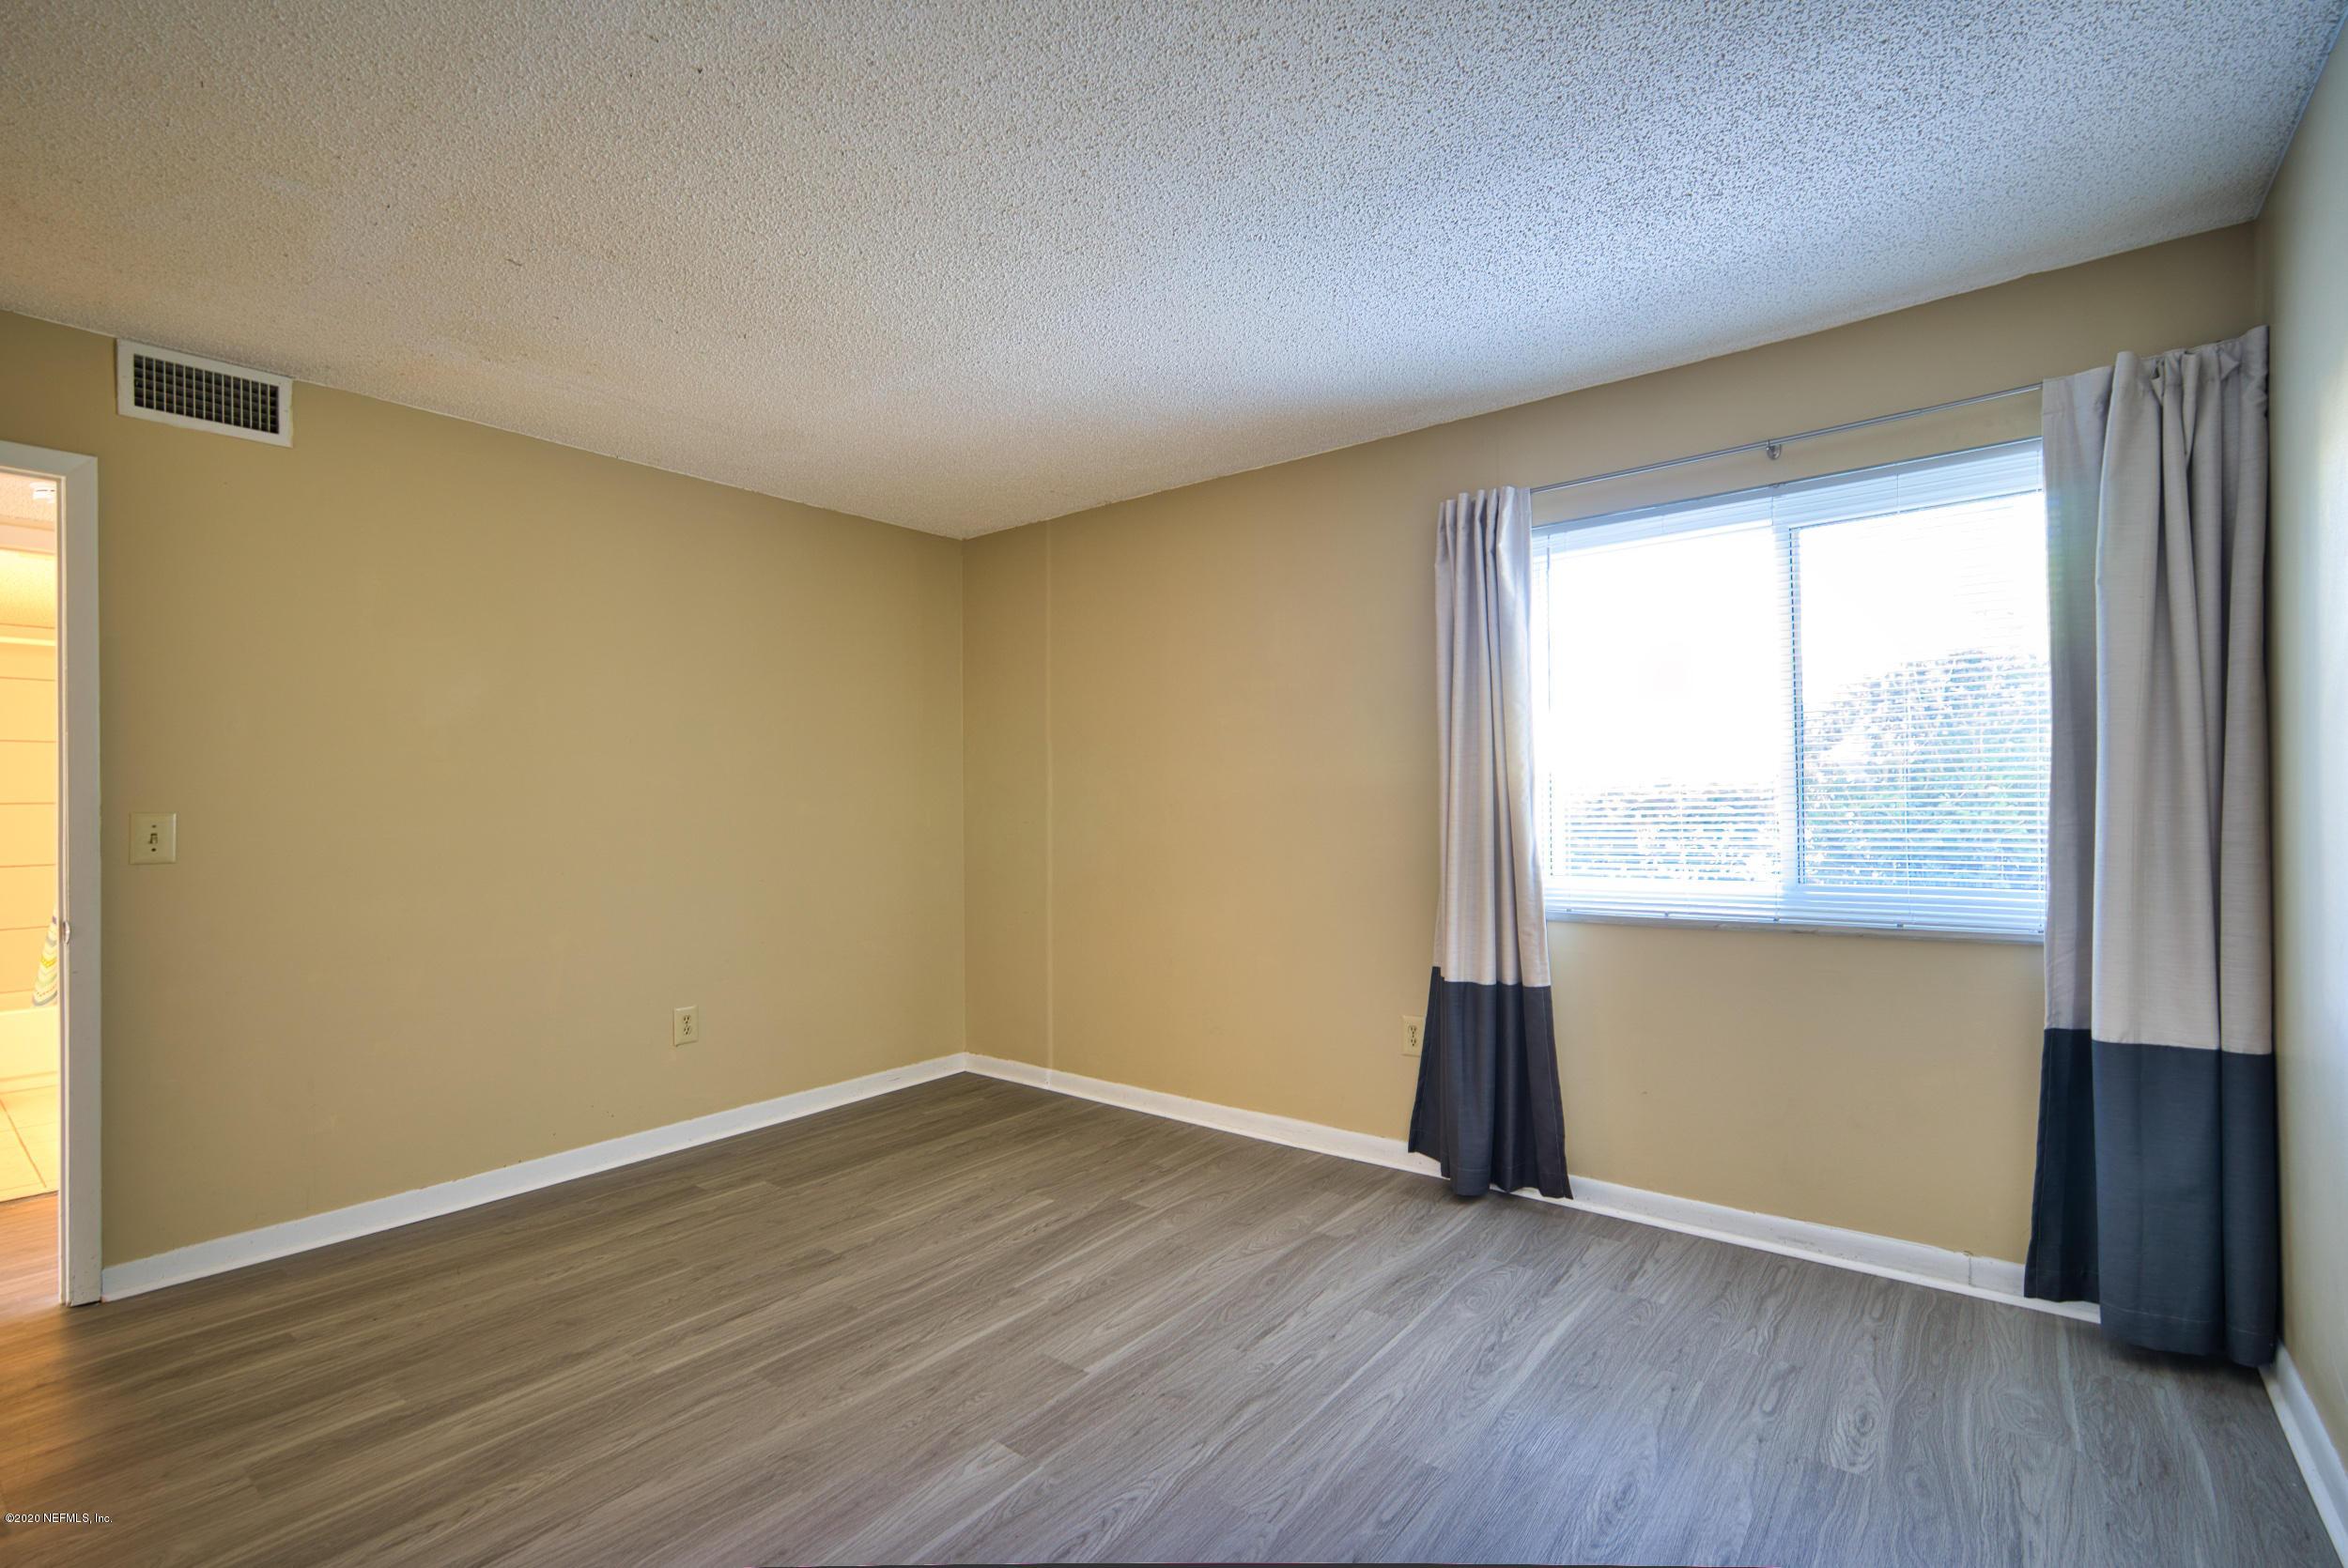 91 TIFTON, PONTE VEDRA BEACH, FLORIDA 32082, 3 Bedrooms Bedrooms, ,2 BathroomsBathrooms,Rental,For Rent,TIFTON,1082996